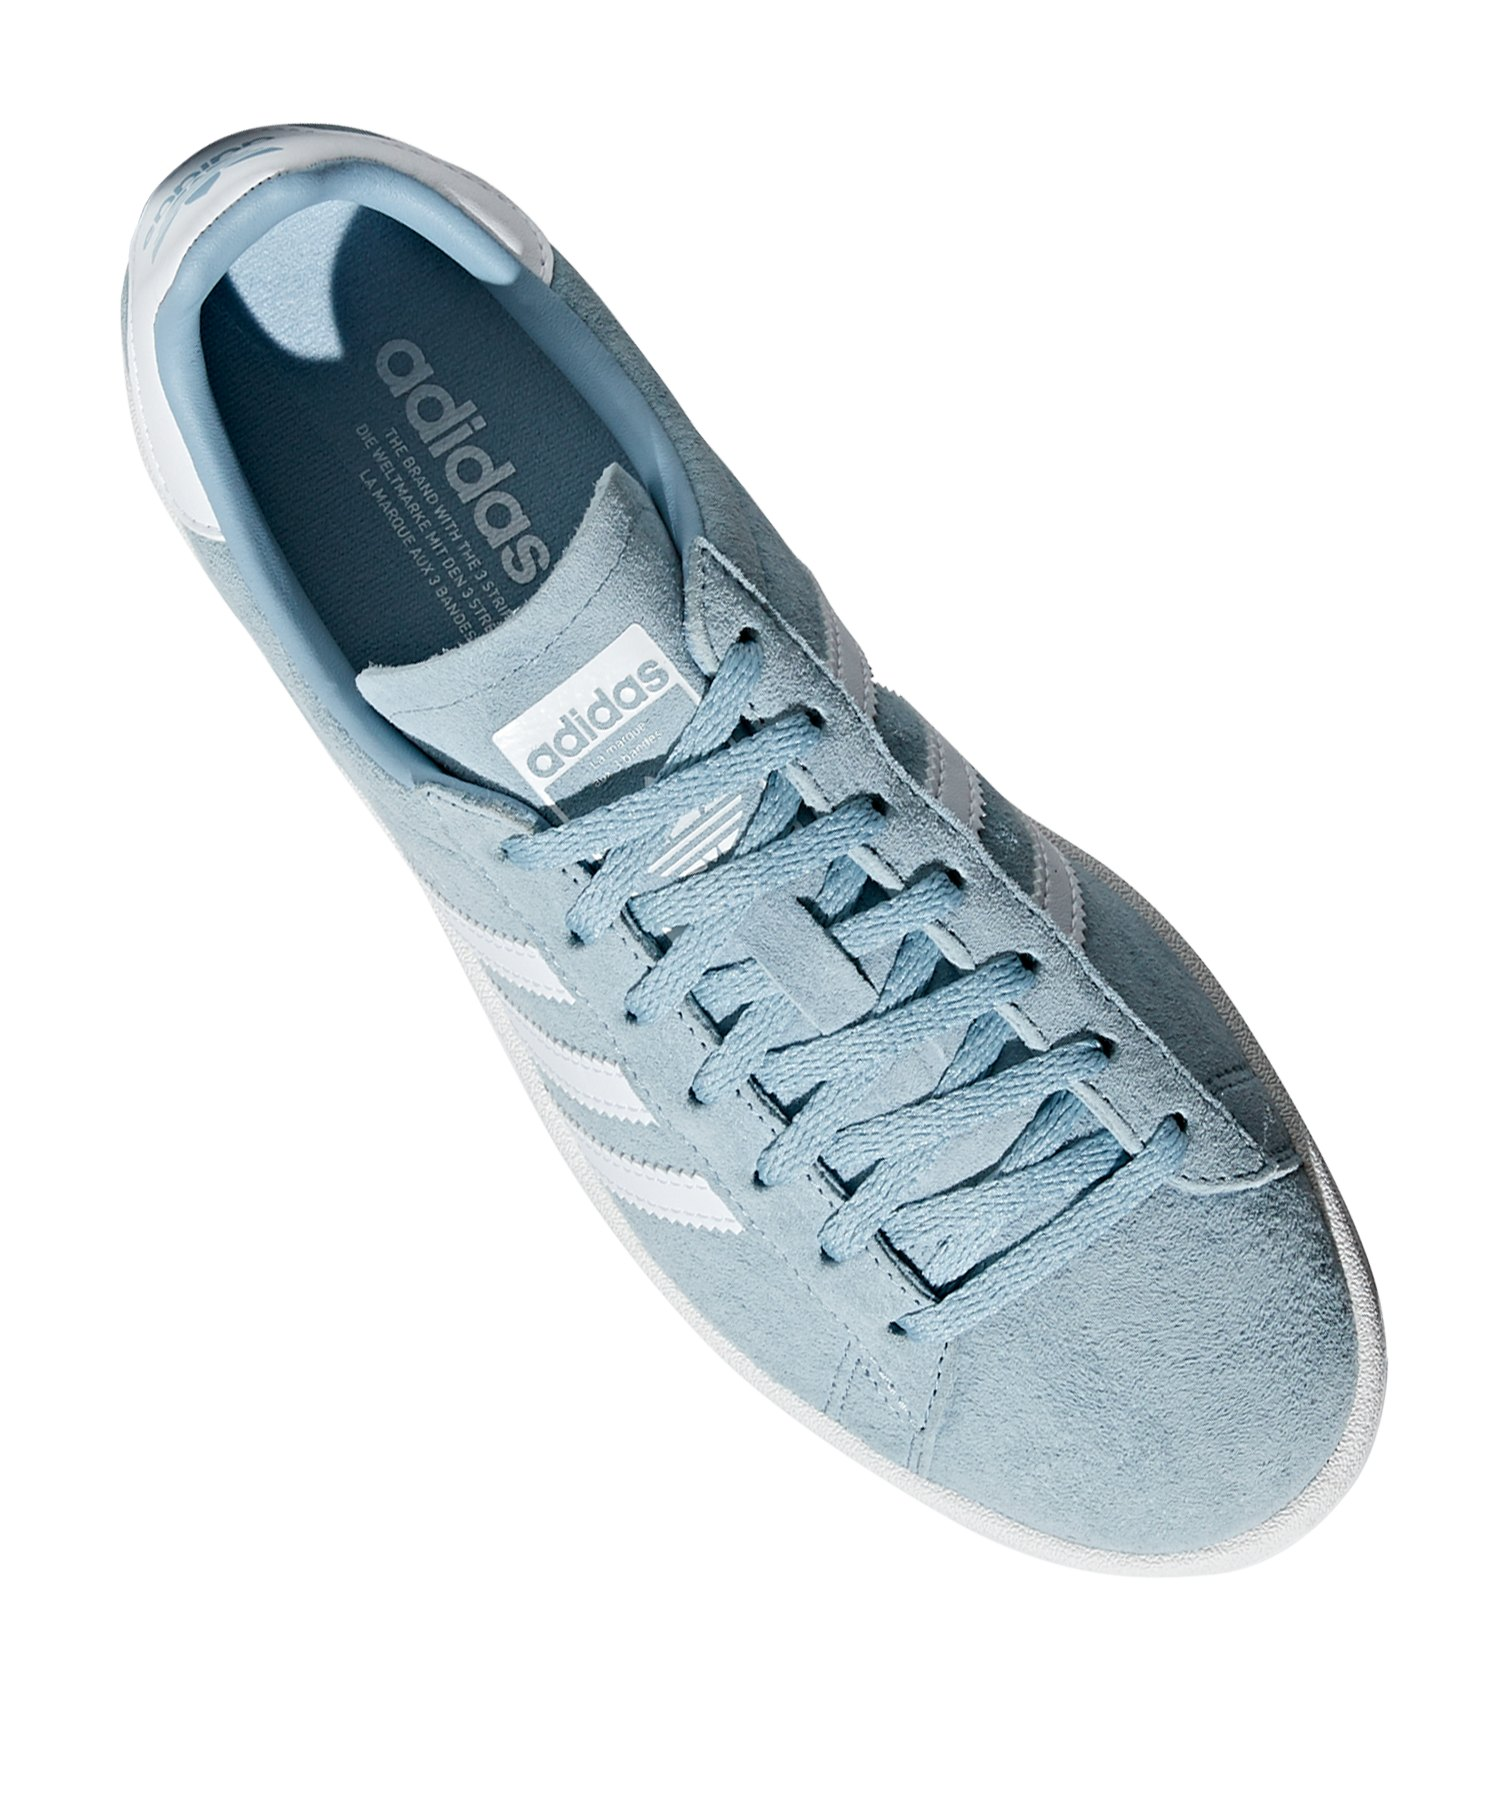 700b6c5b2b759b ... adidas Originals Campus Sneaker Damen Blau Weiss - blau ...